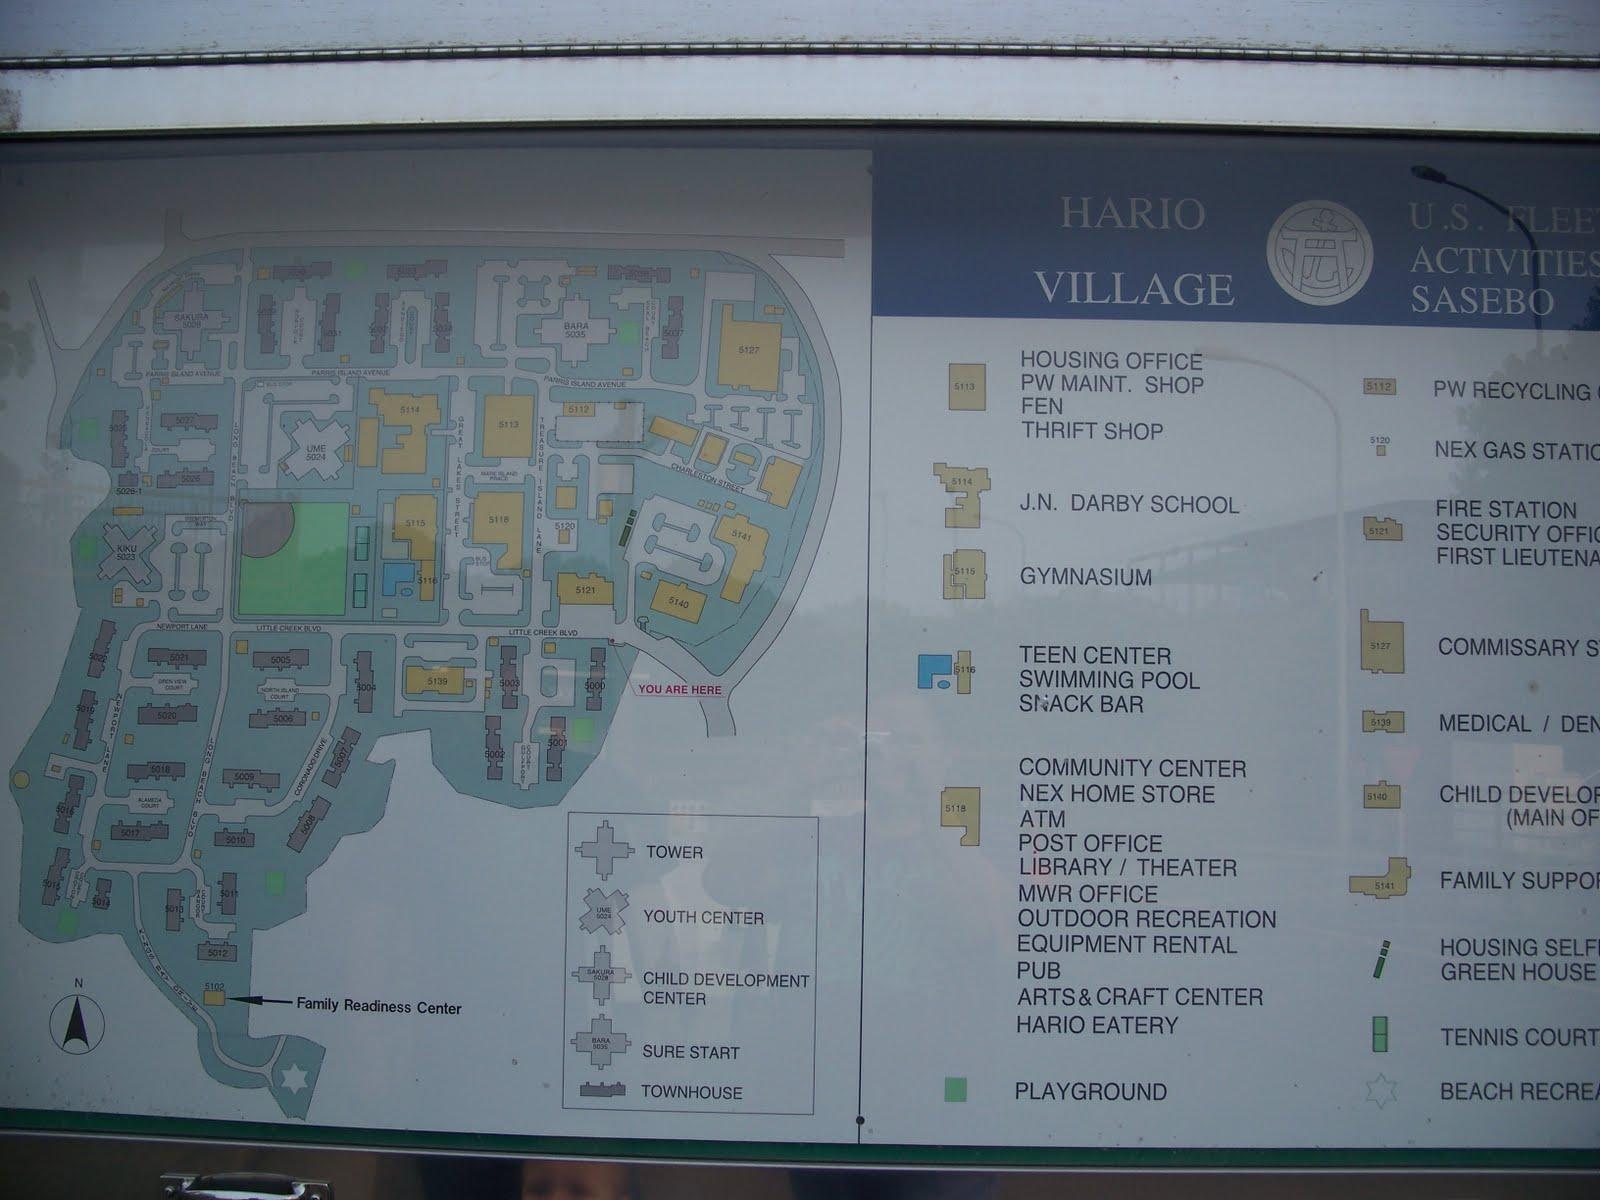 The Barbers In Sasebo Japan Map Of Hario Village